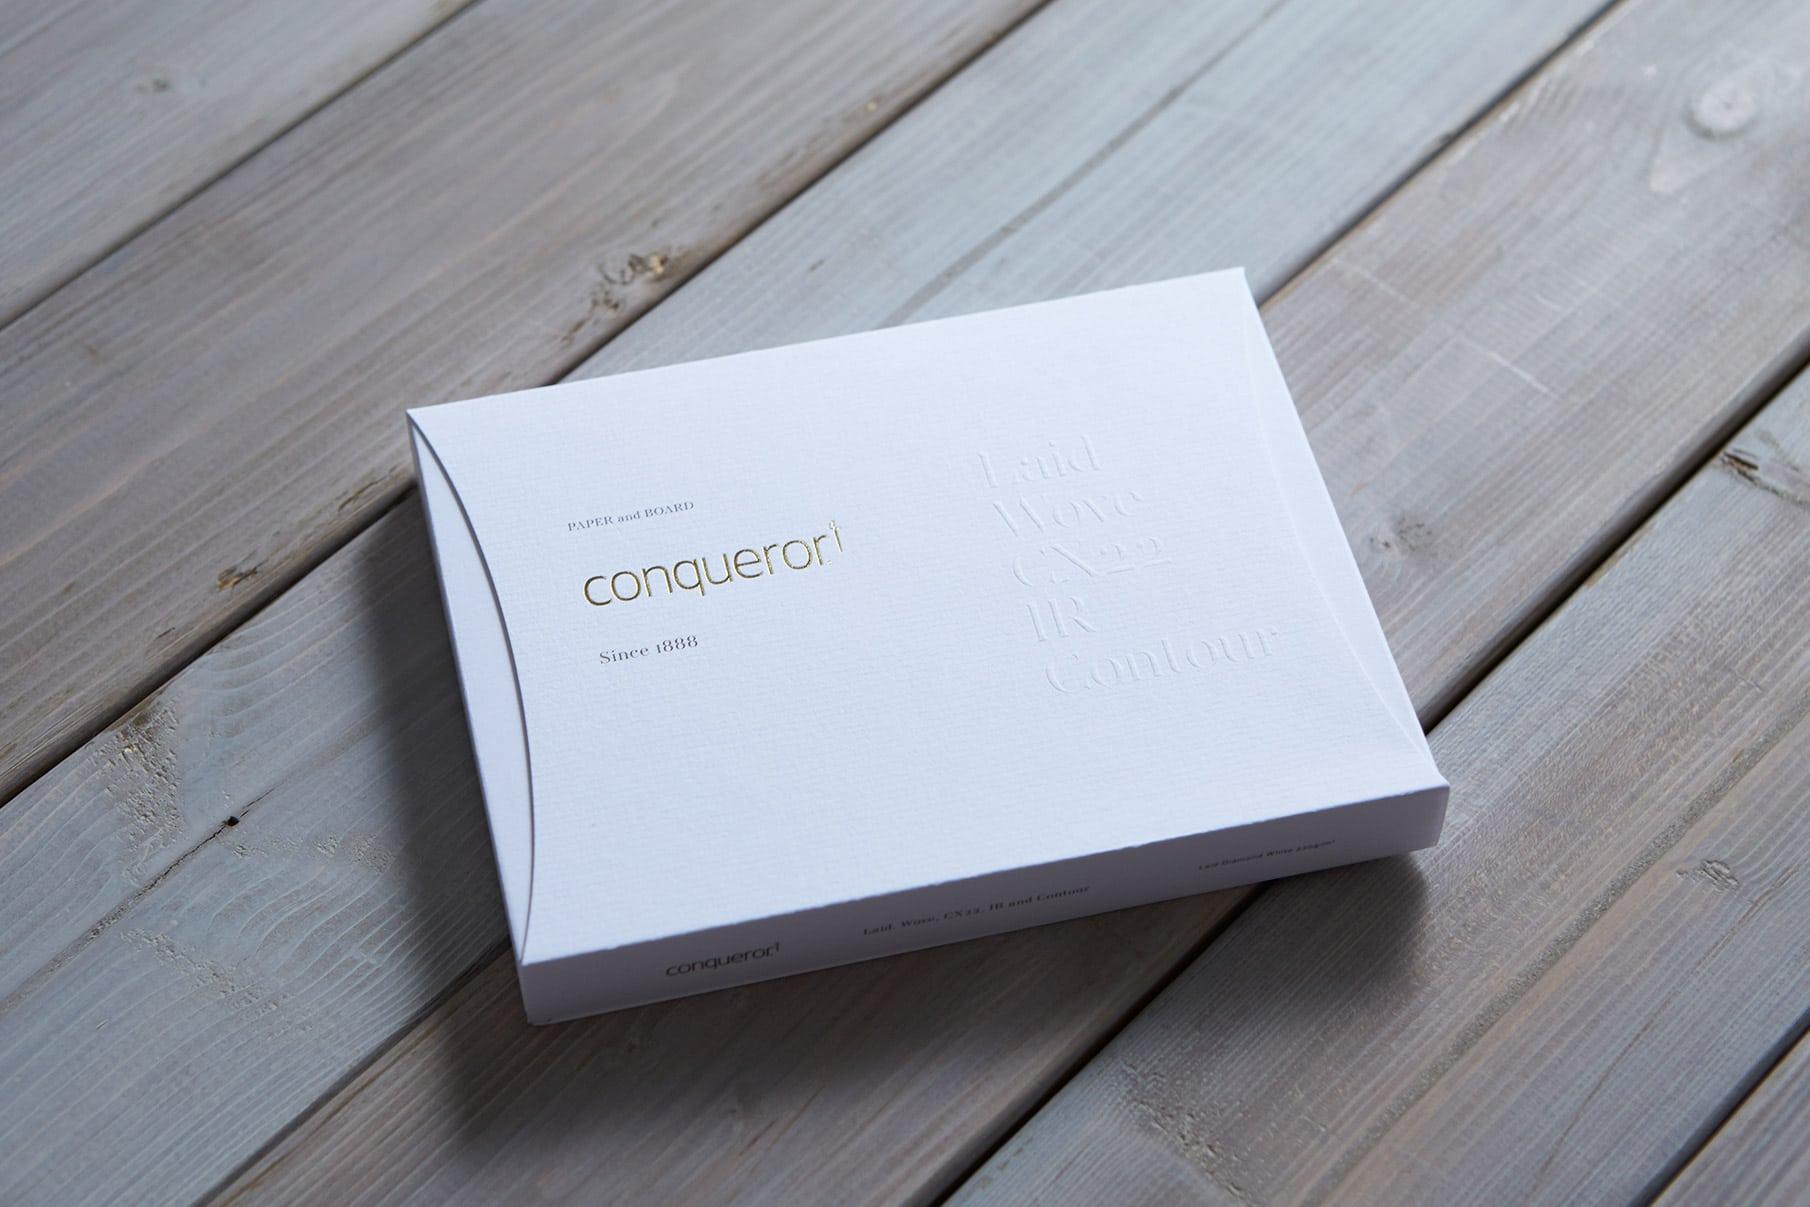 Conqueror - Promotion Box 1